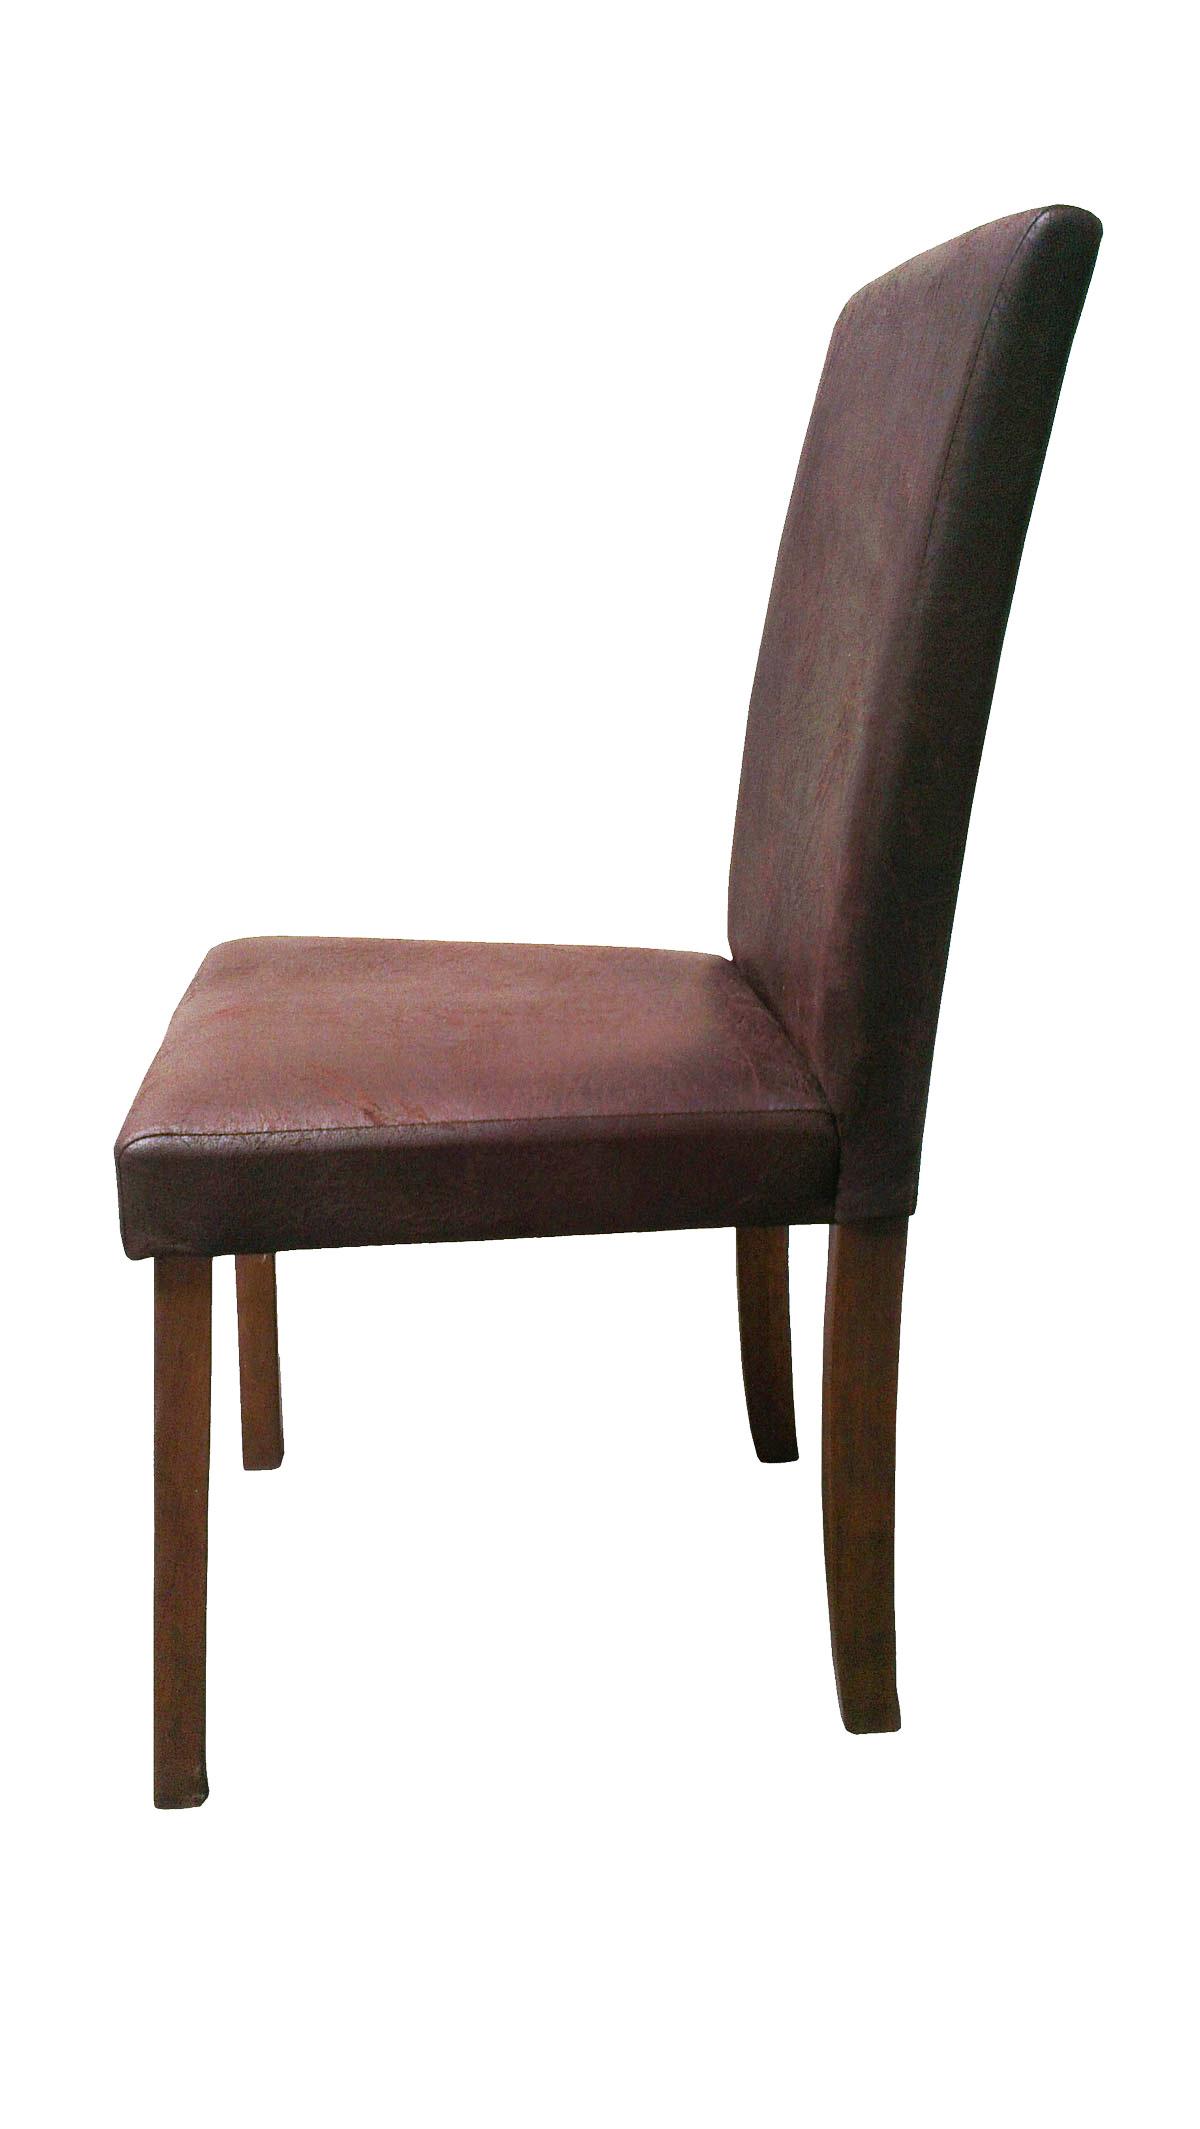 sam tischgruppe tom 160 cm mit billi st hle 7tlg massiv nussbaum auf lager. Black Bedroom Furniture Sets. Home Design Ideas